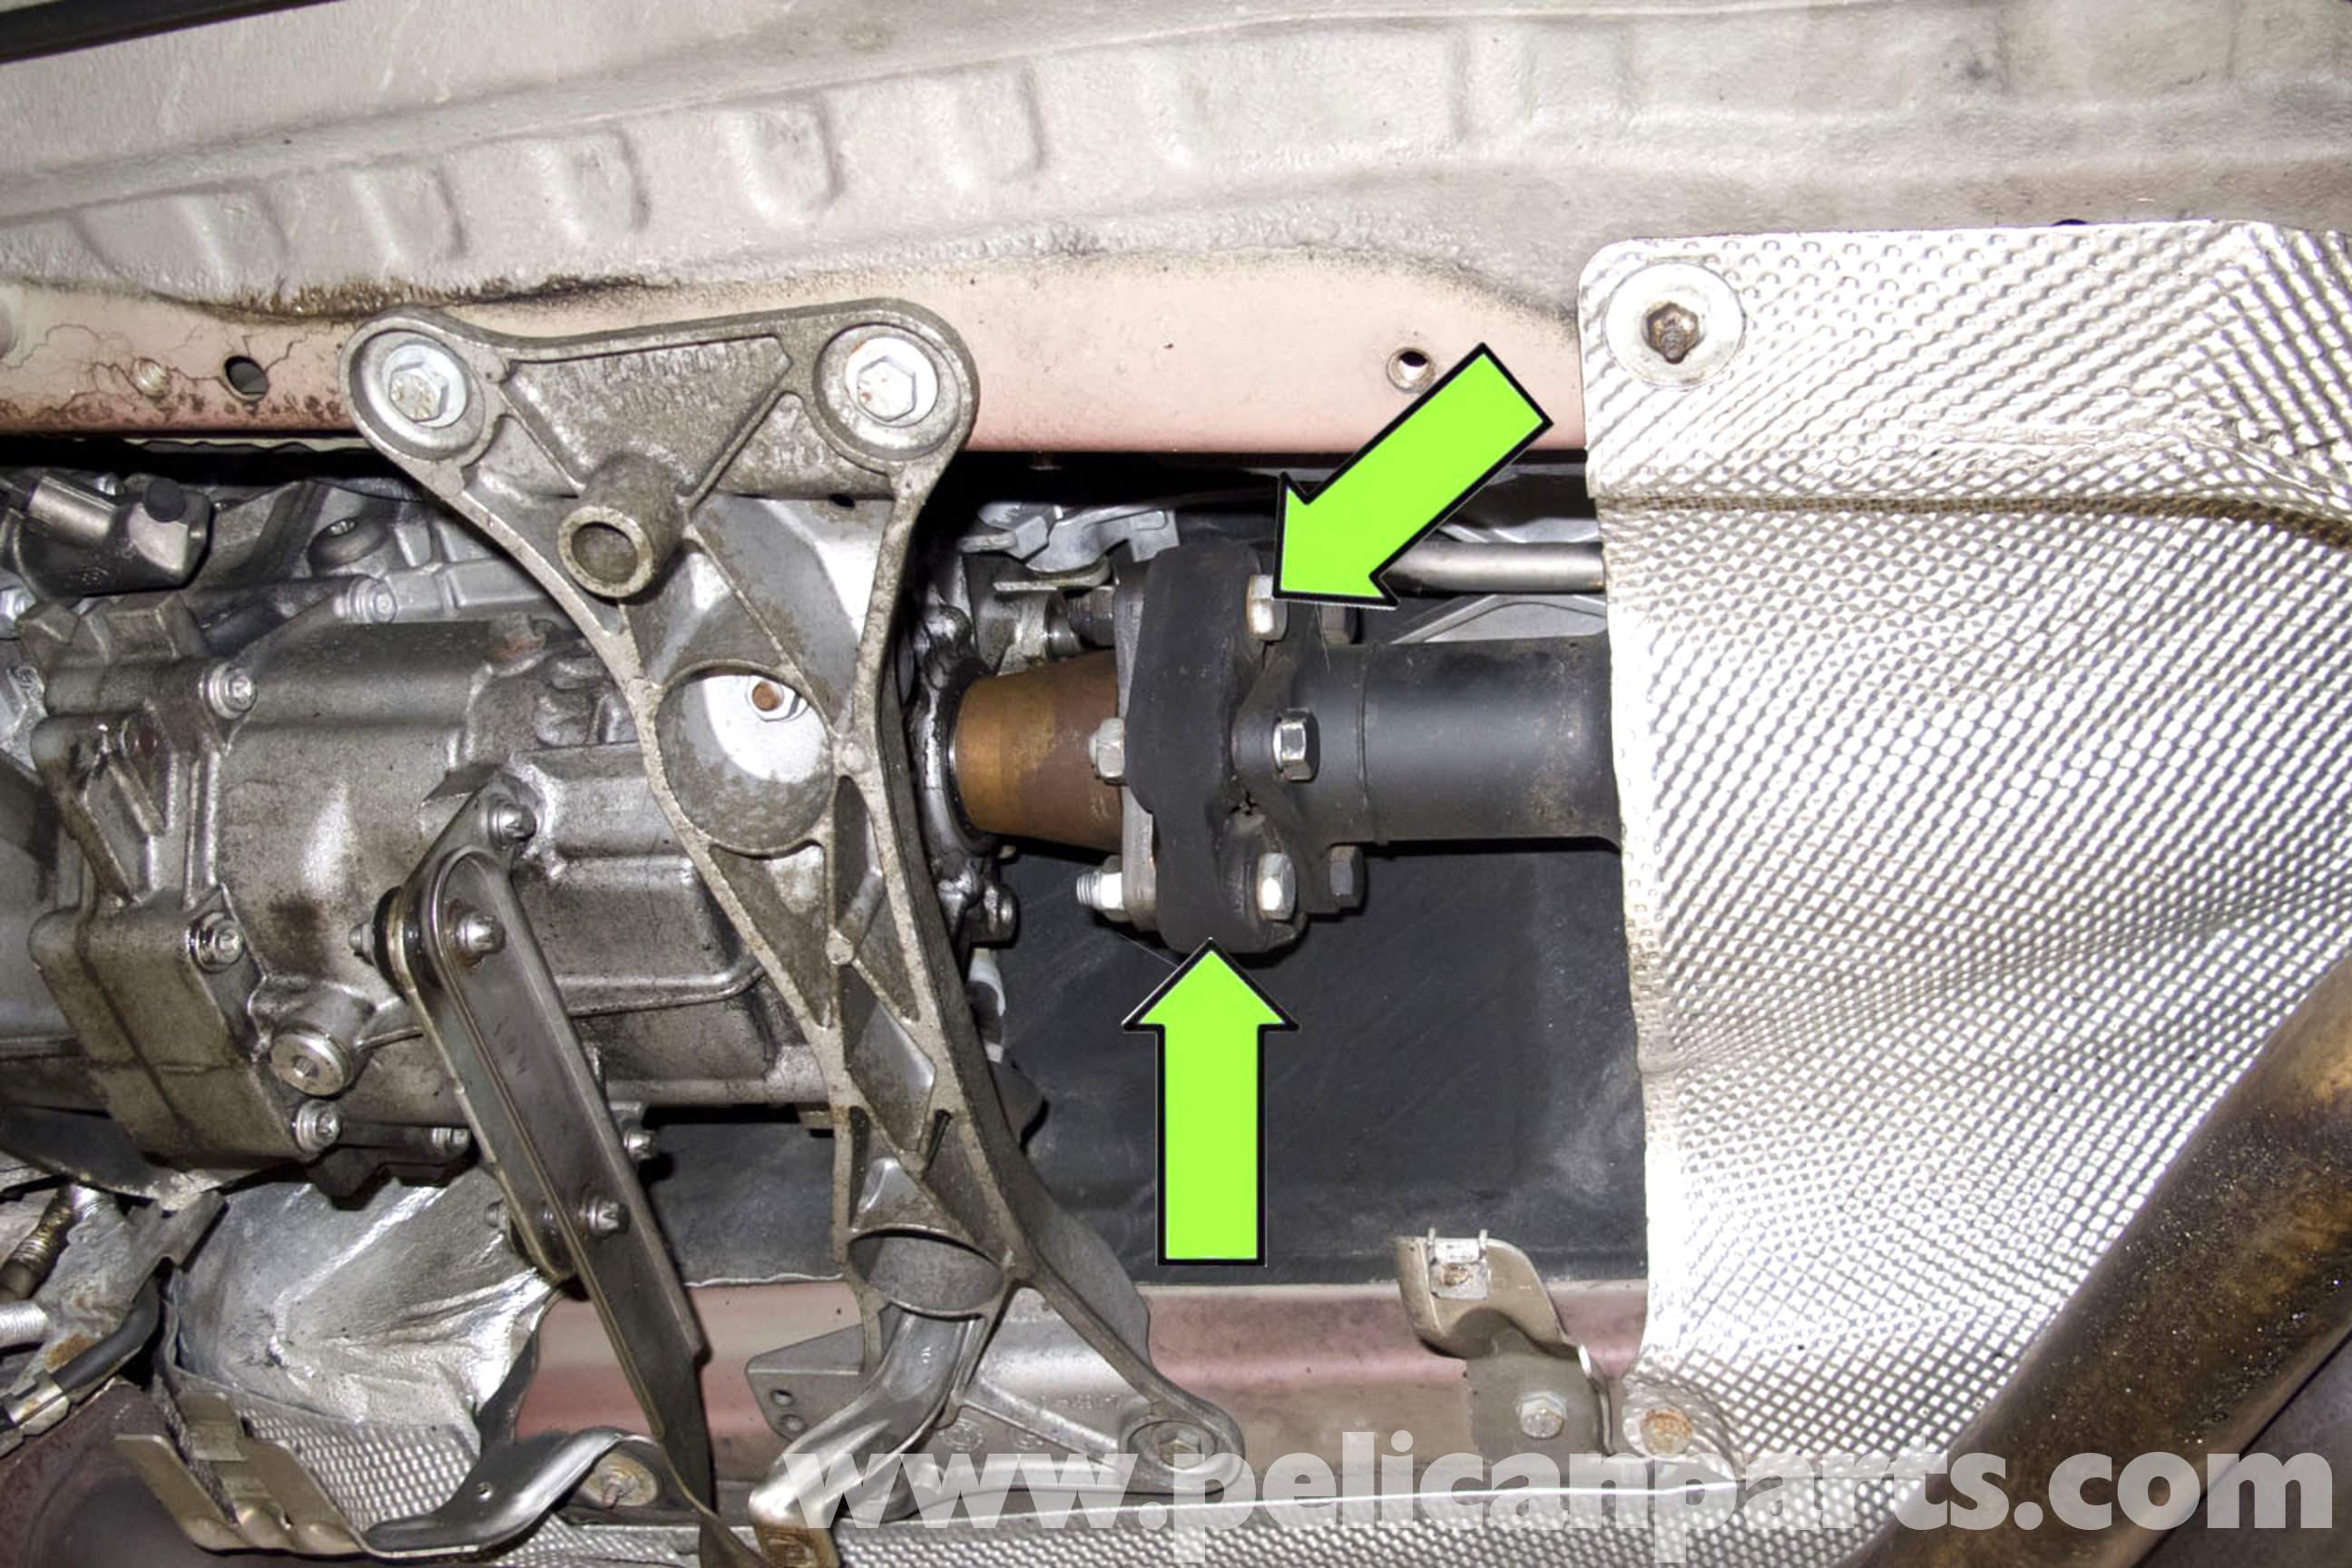 Bmw E90 Clutch Replacement E91 E92 E93 Pelican Parts Diy Maintenance Article